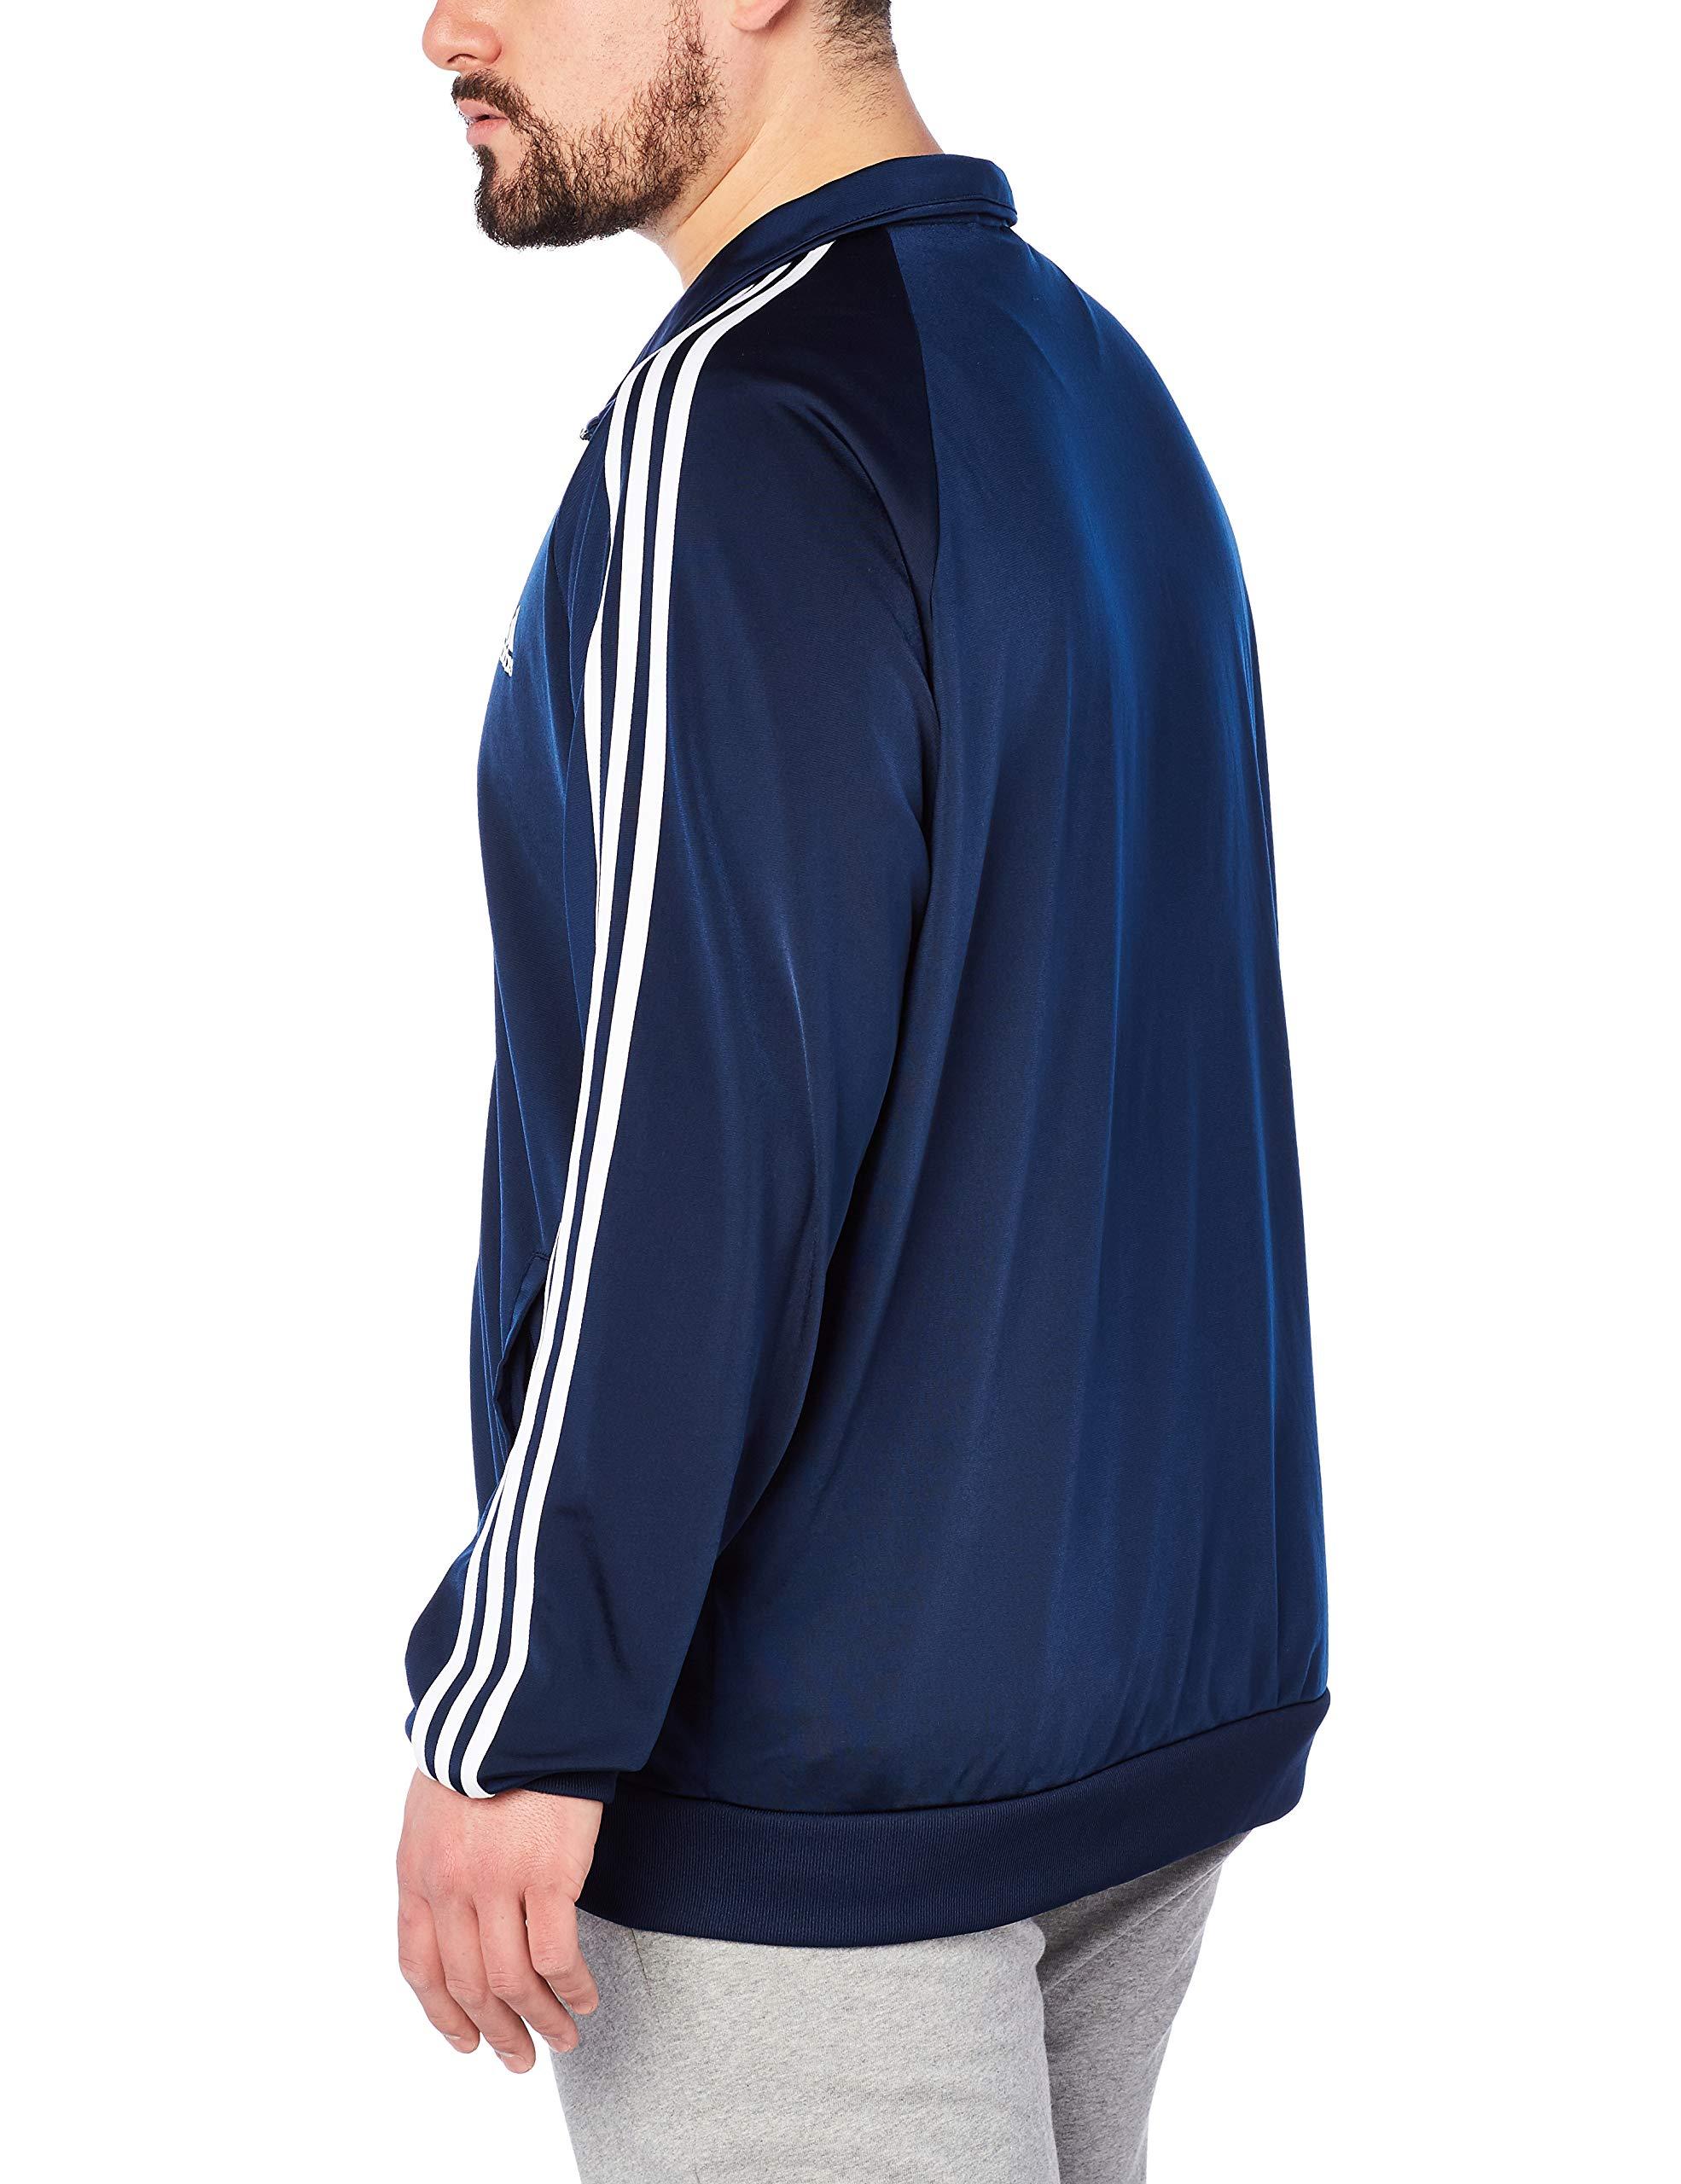 adidas Men's Essentials 3-Stripe Tricot Track Jacket, Collegiate Navy/White, Medium by adidas (Image #4)